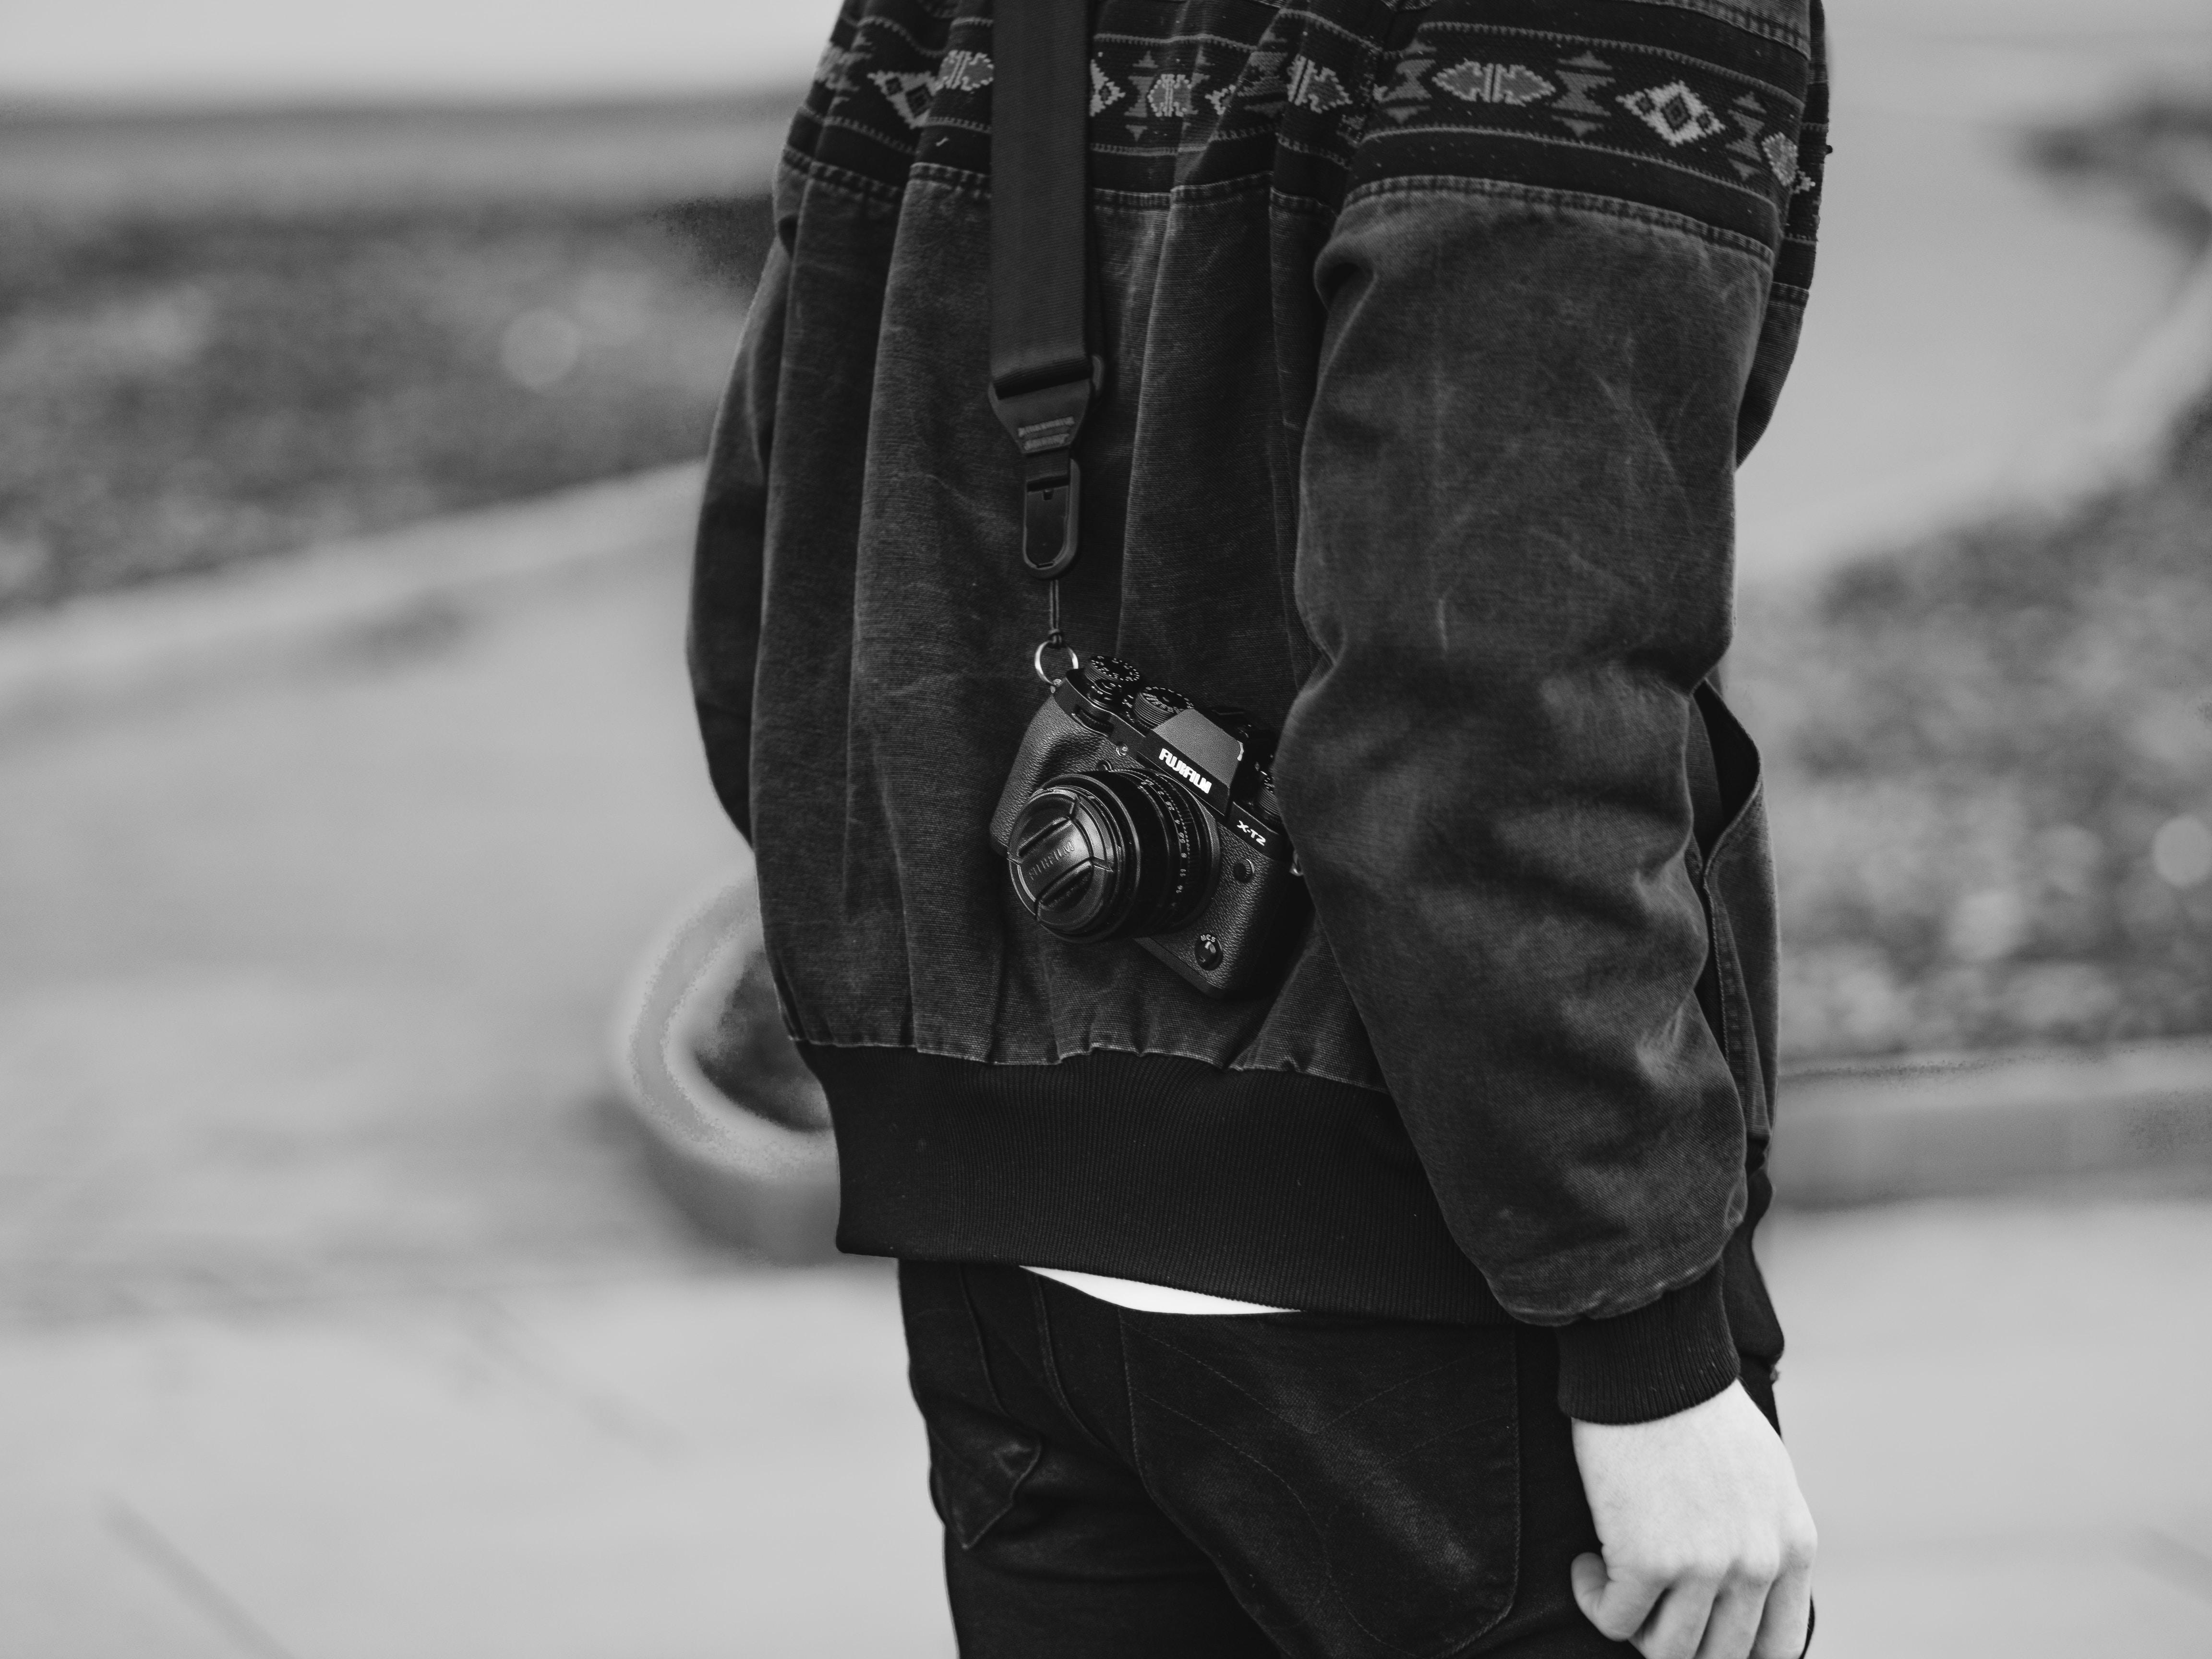 man carrying black DSLR camera